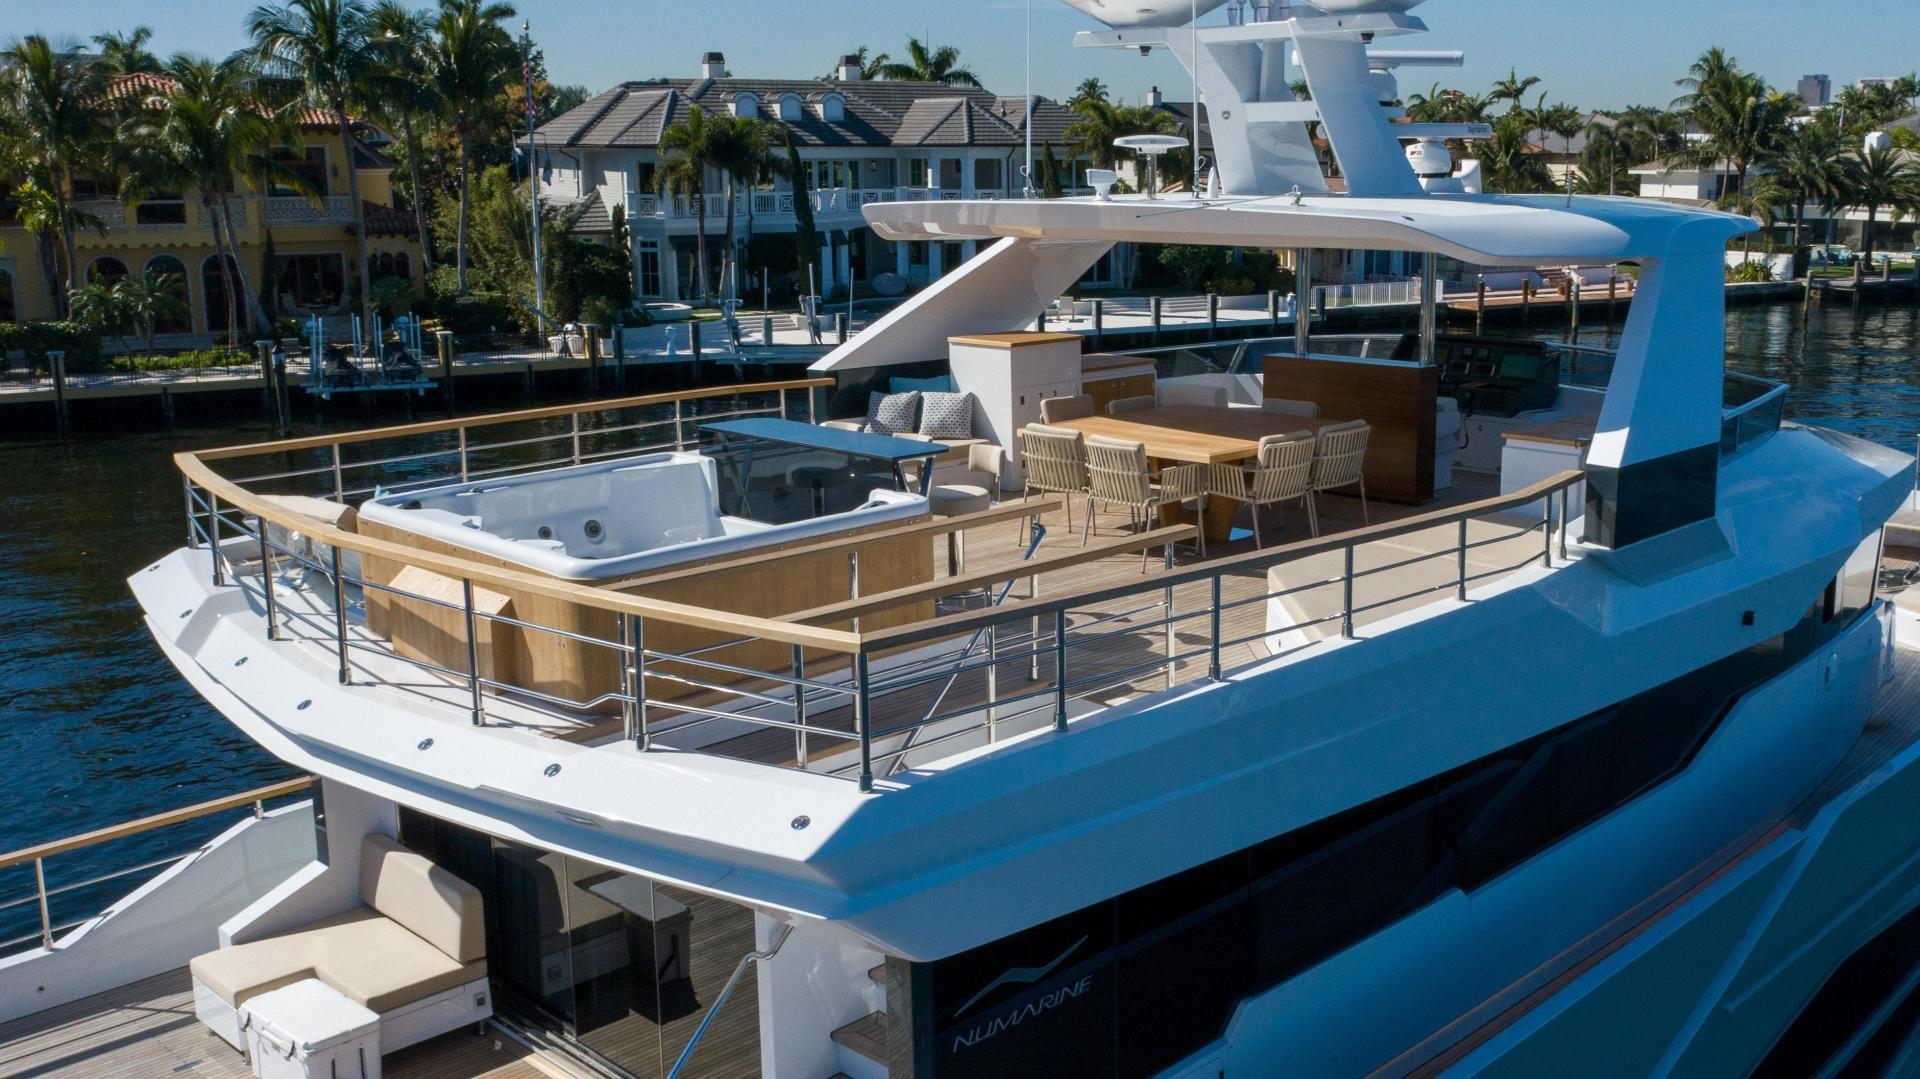 Numarine-32XP 2020-7 Diamonds Fort Lauderdale-Florida-United States-1629340 | Thumbnail